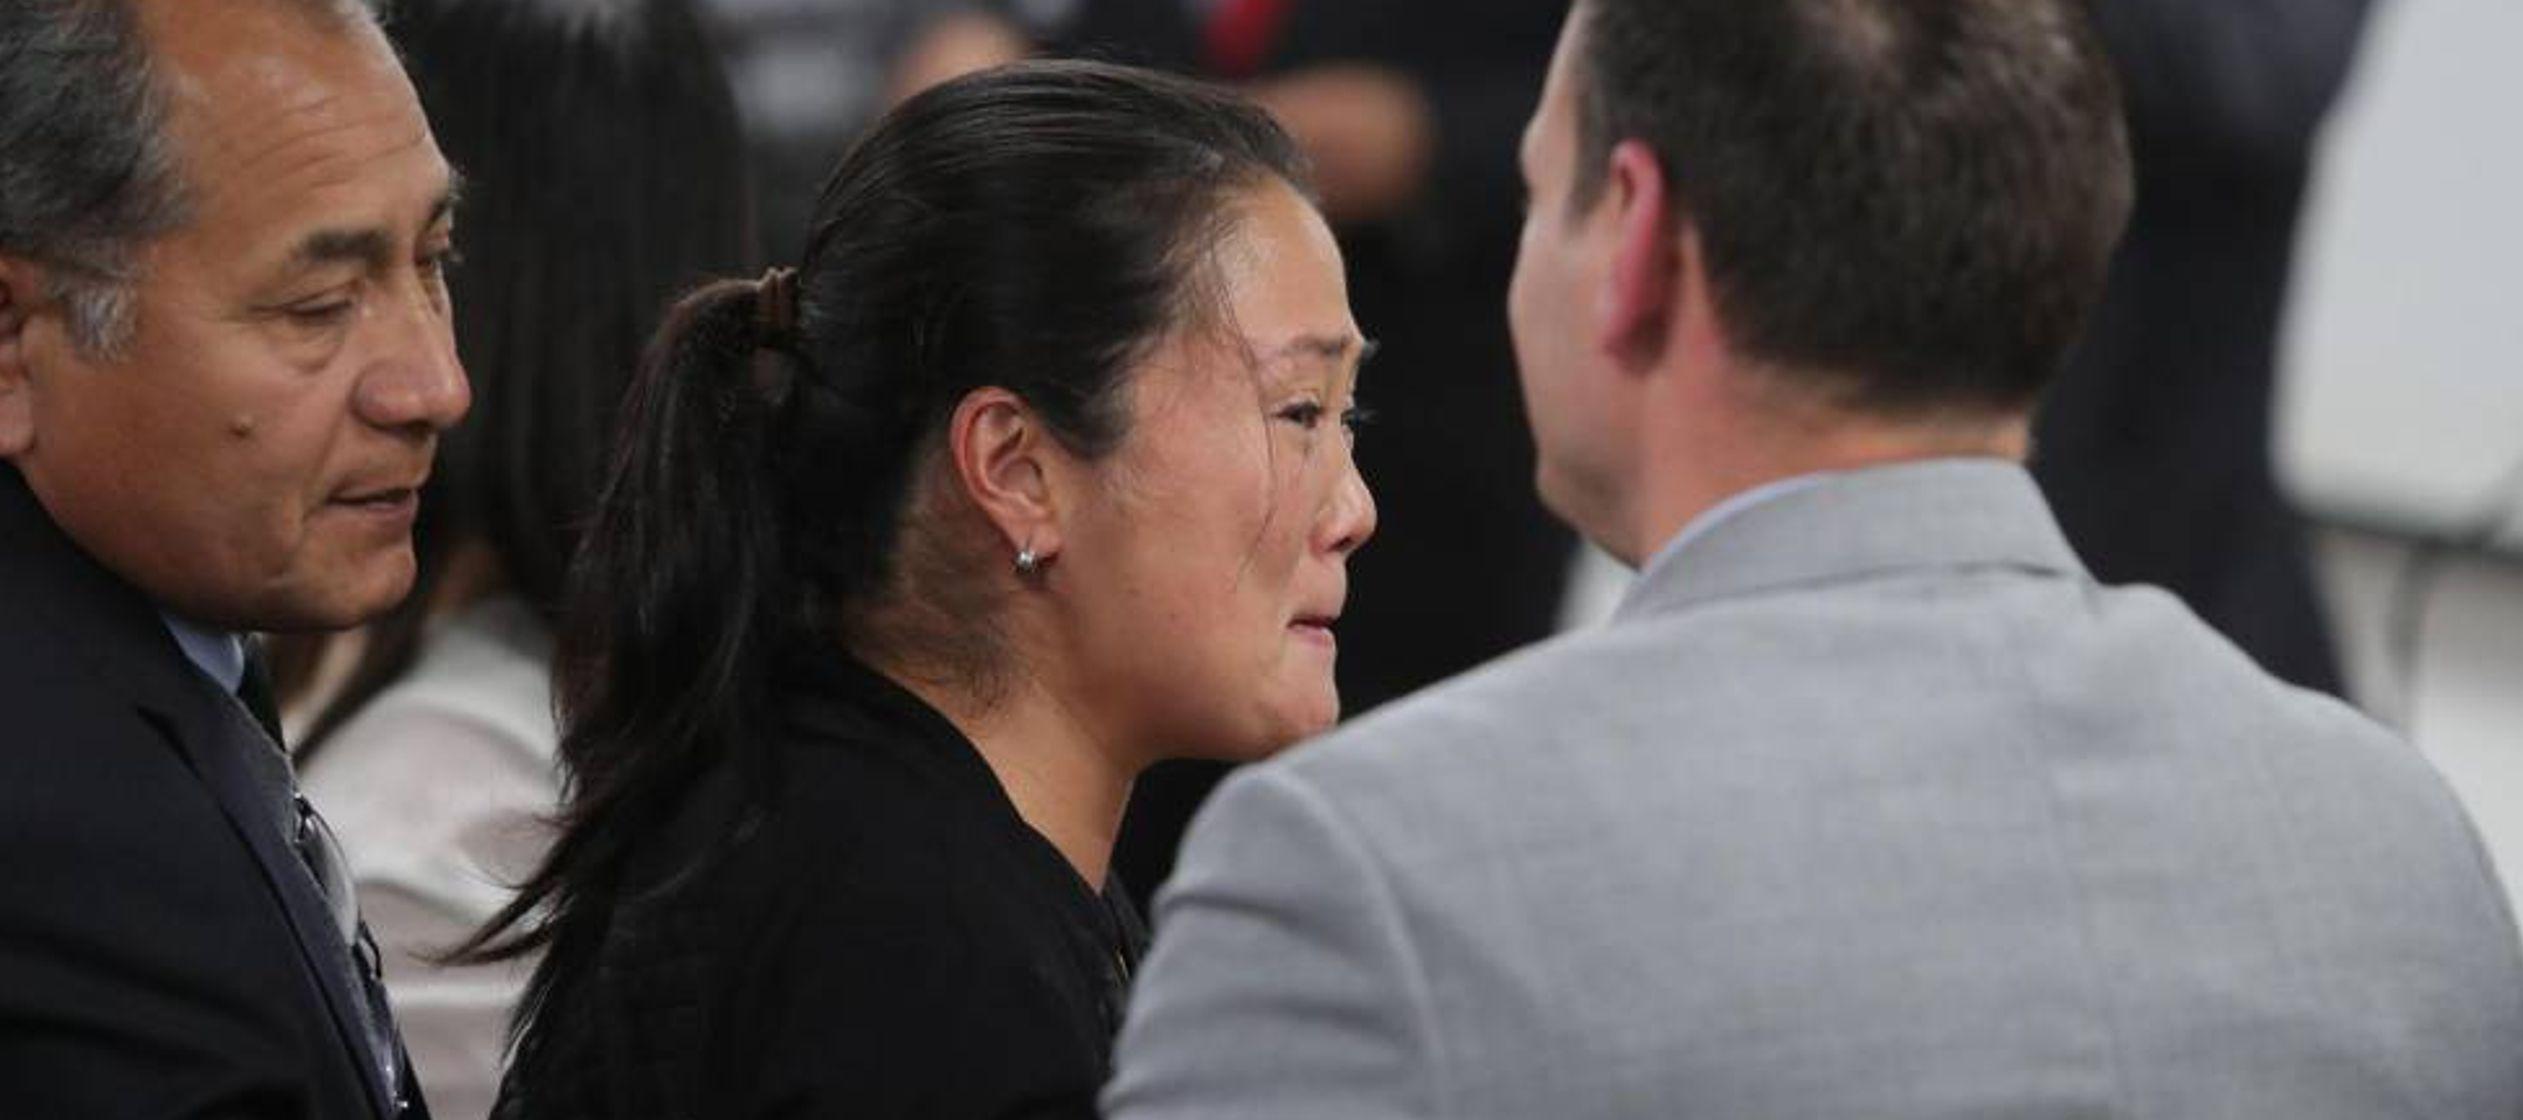 La justicia peruana deja libre a Keiko Fujimori una semana después de su arresto